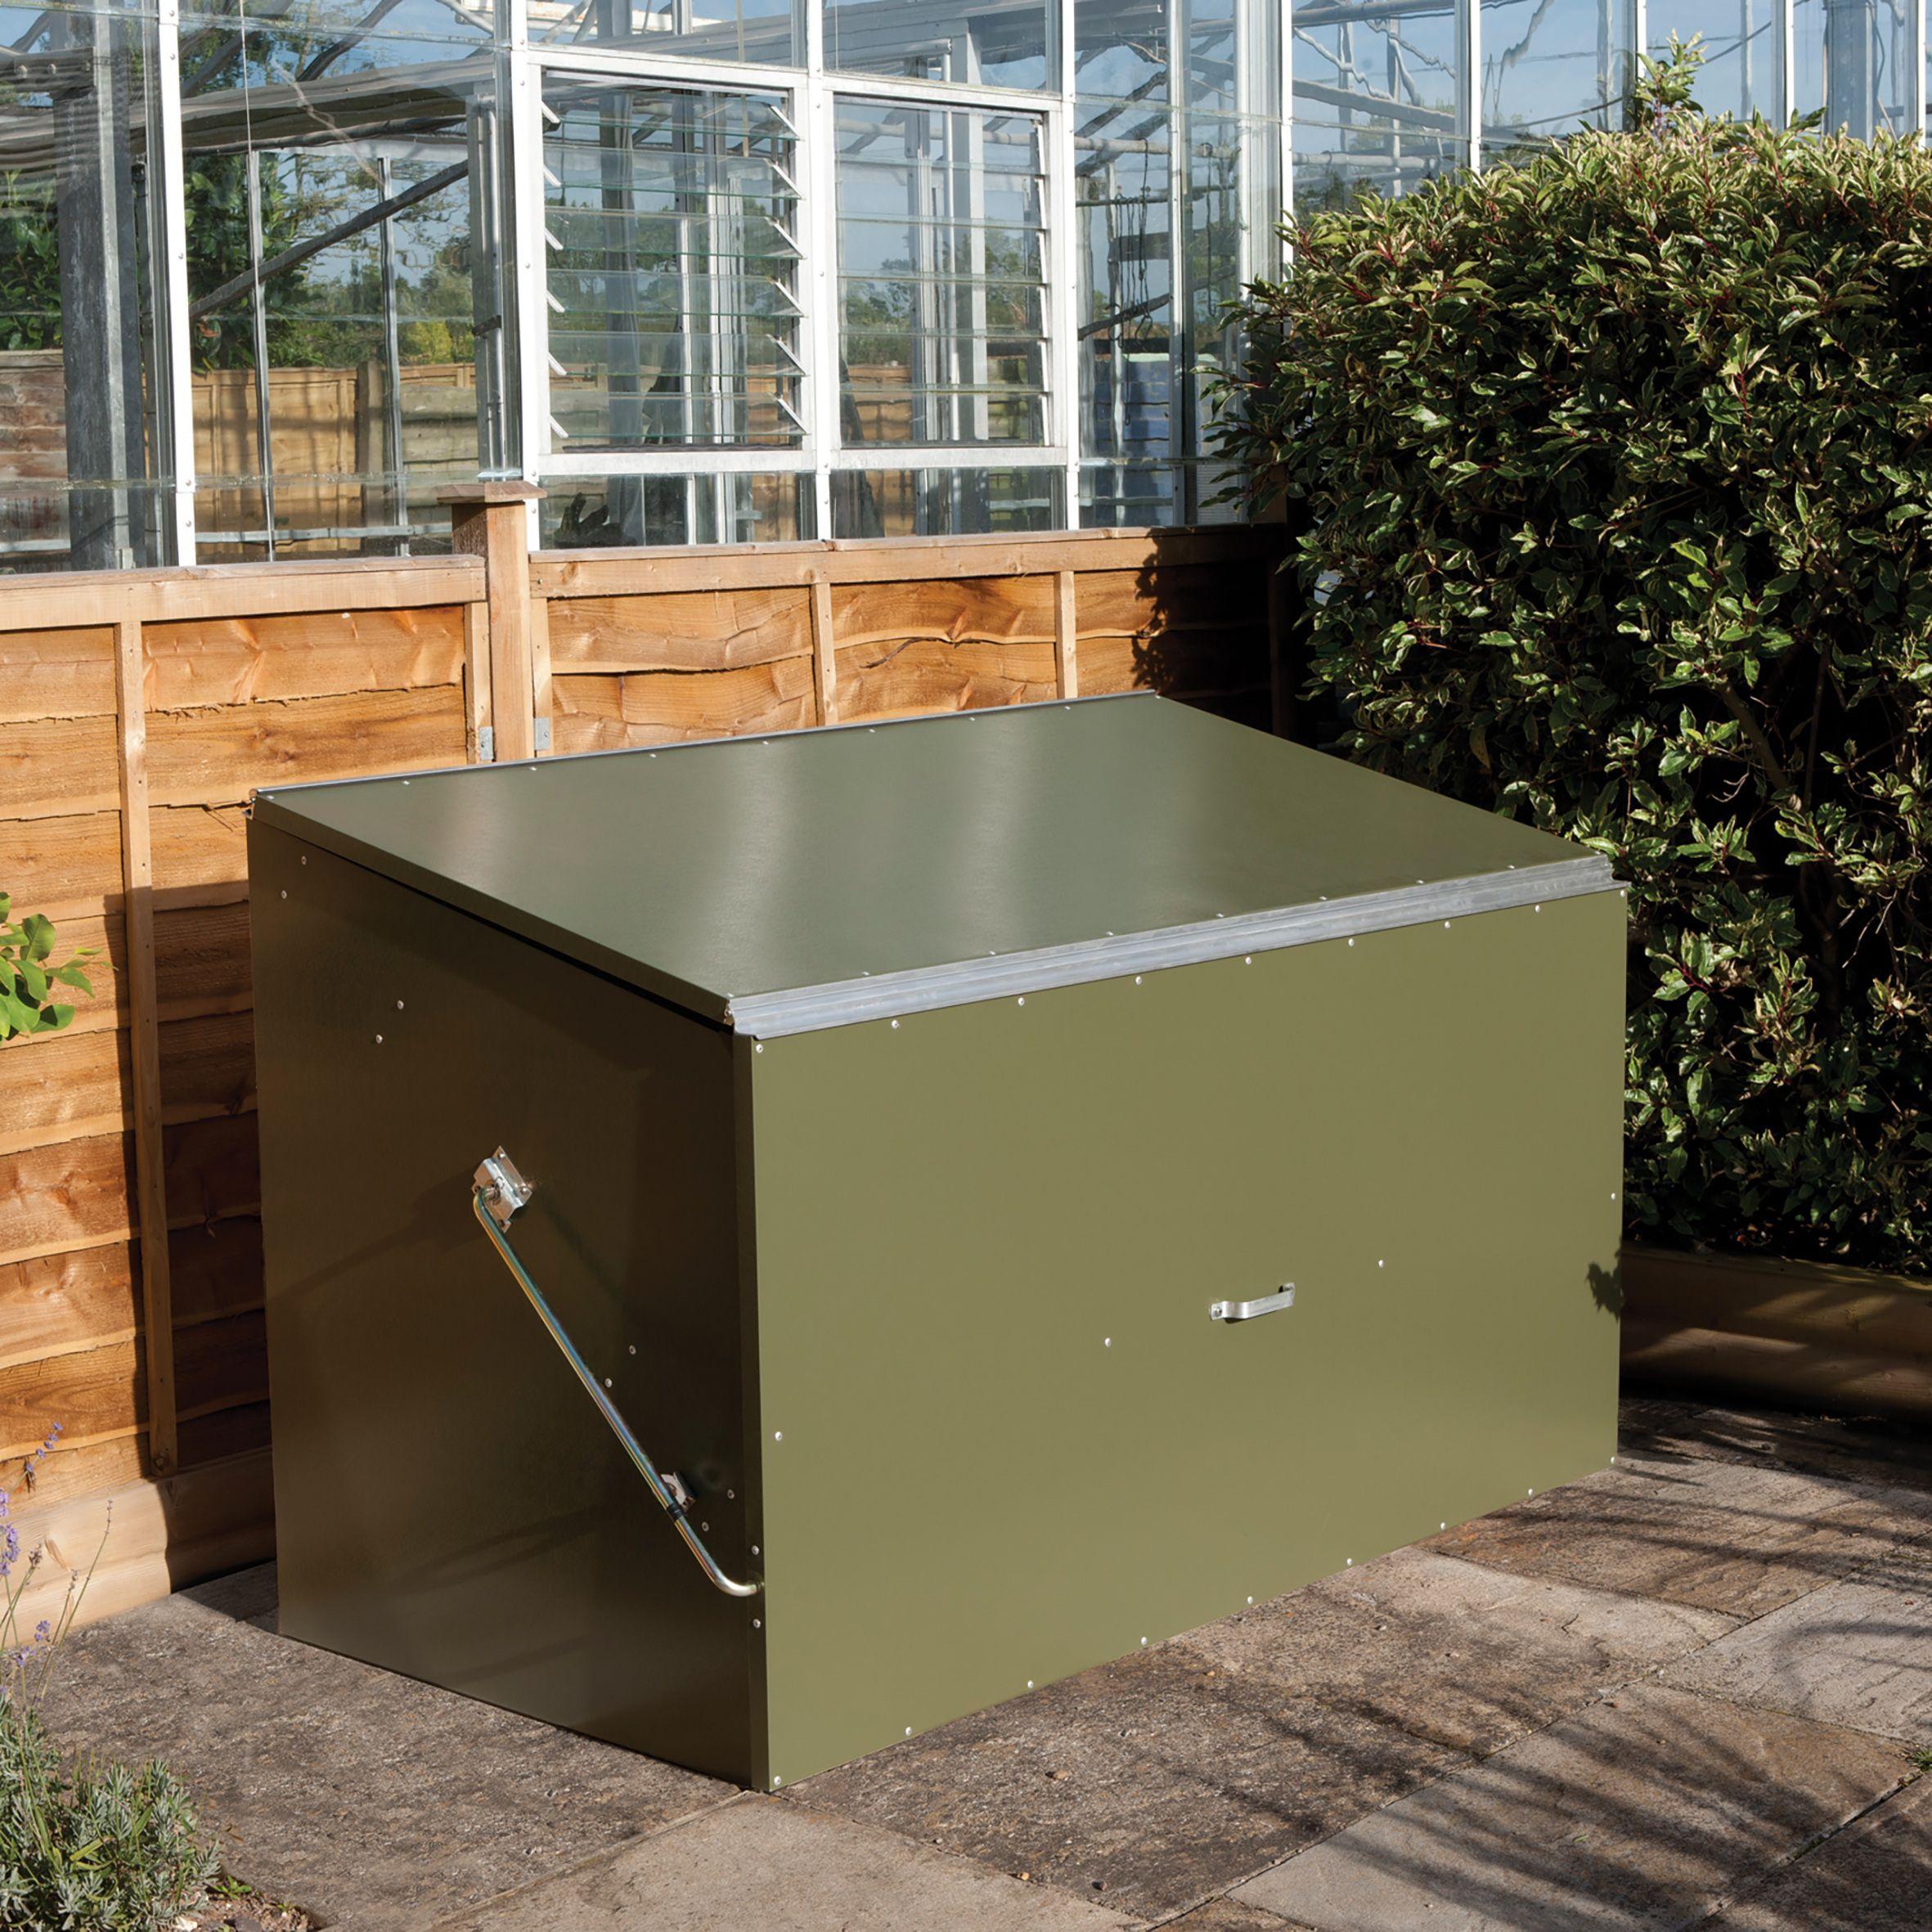 Pent Metal Garden Storage Box 6x3 Departments Diy At B Amp Q